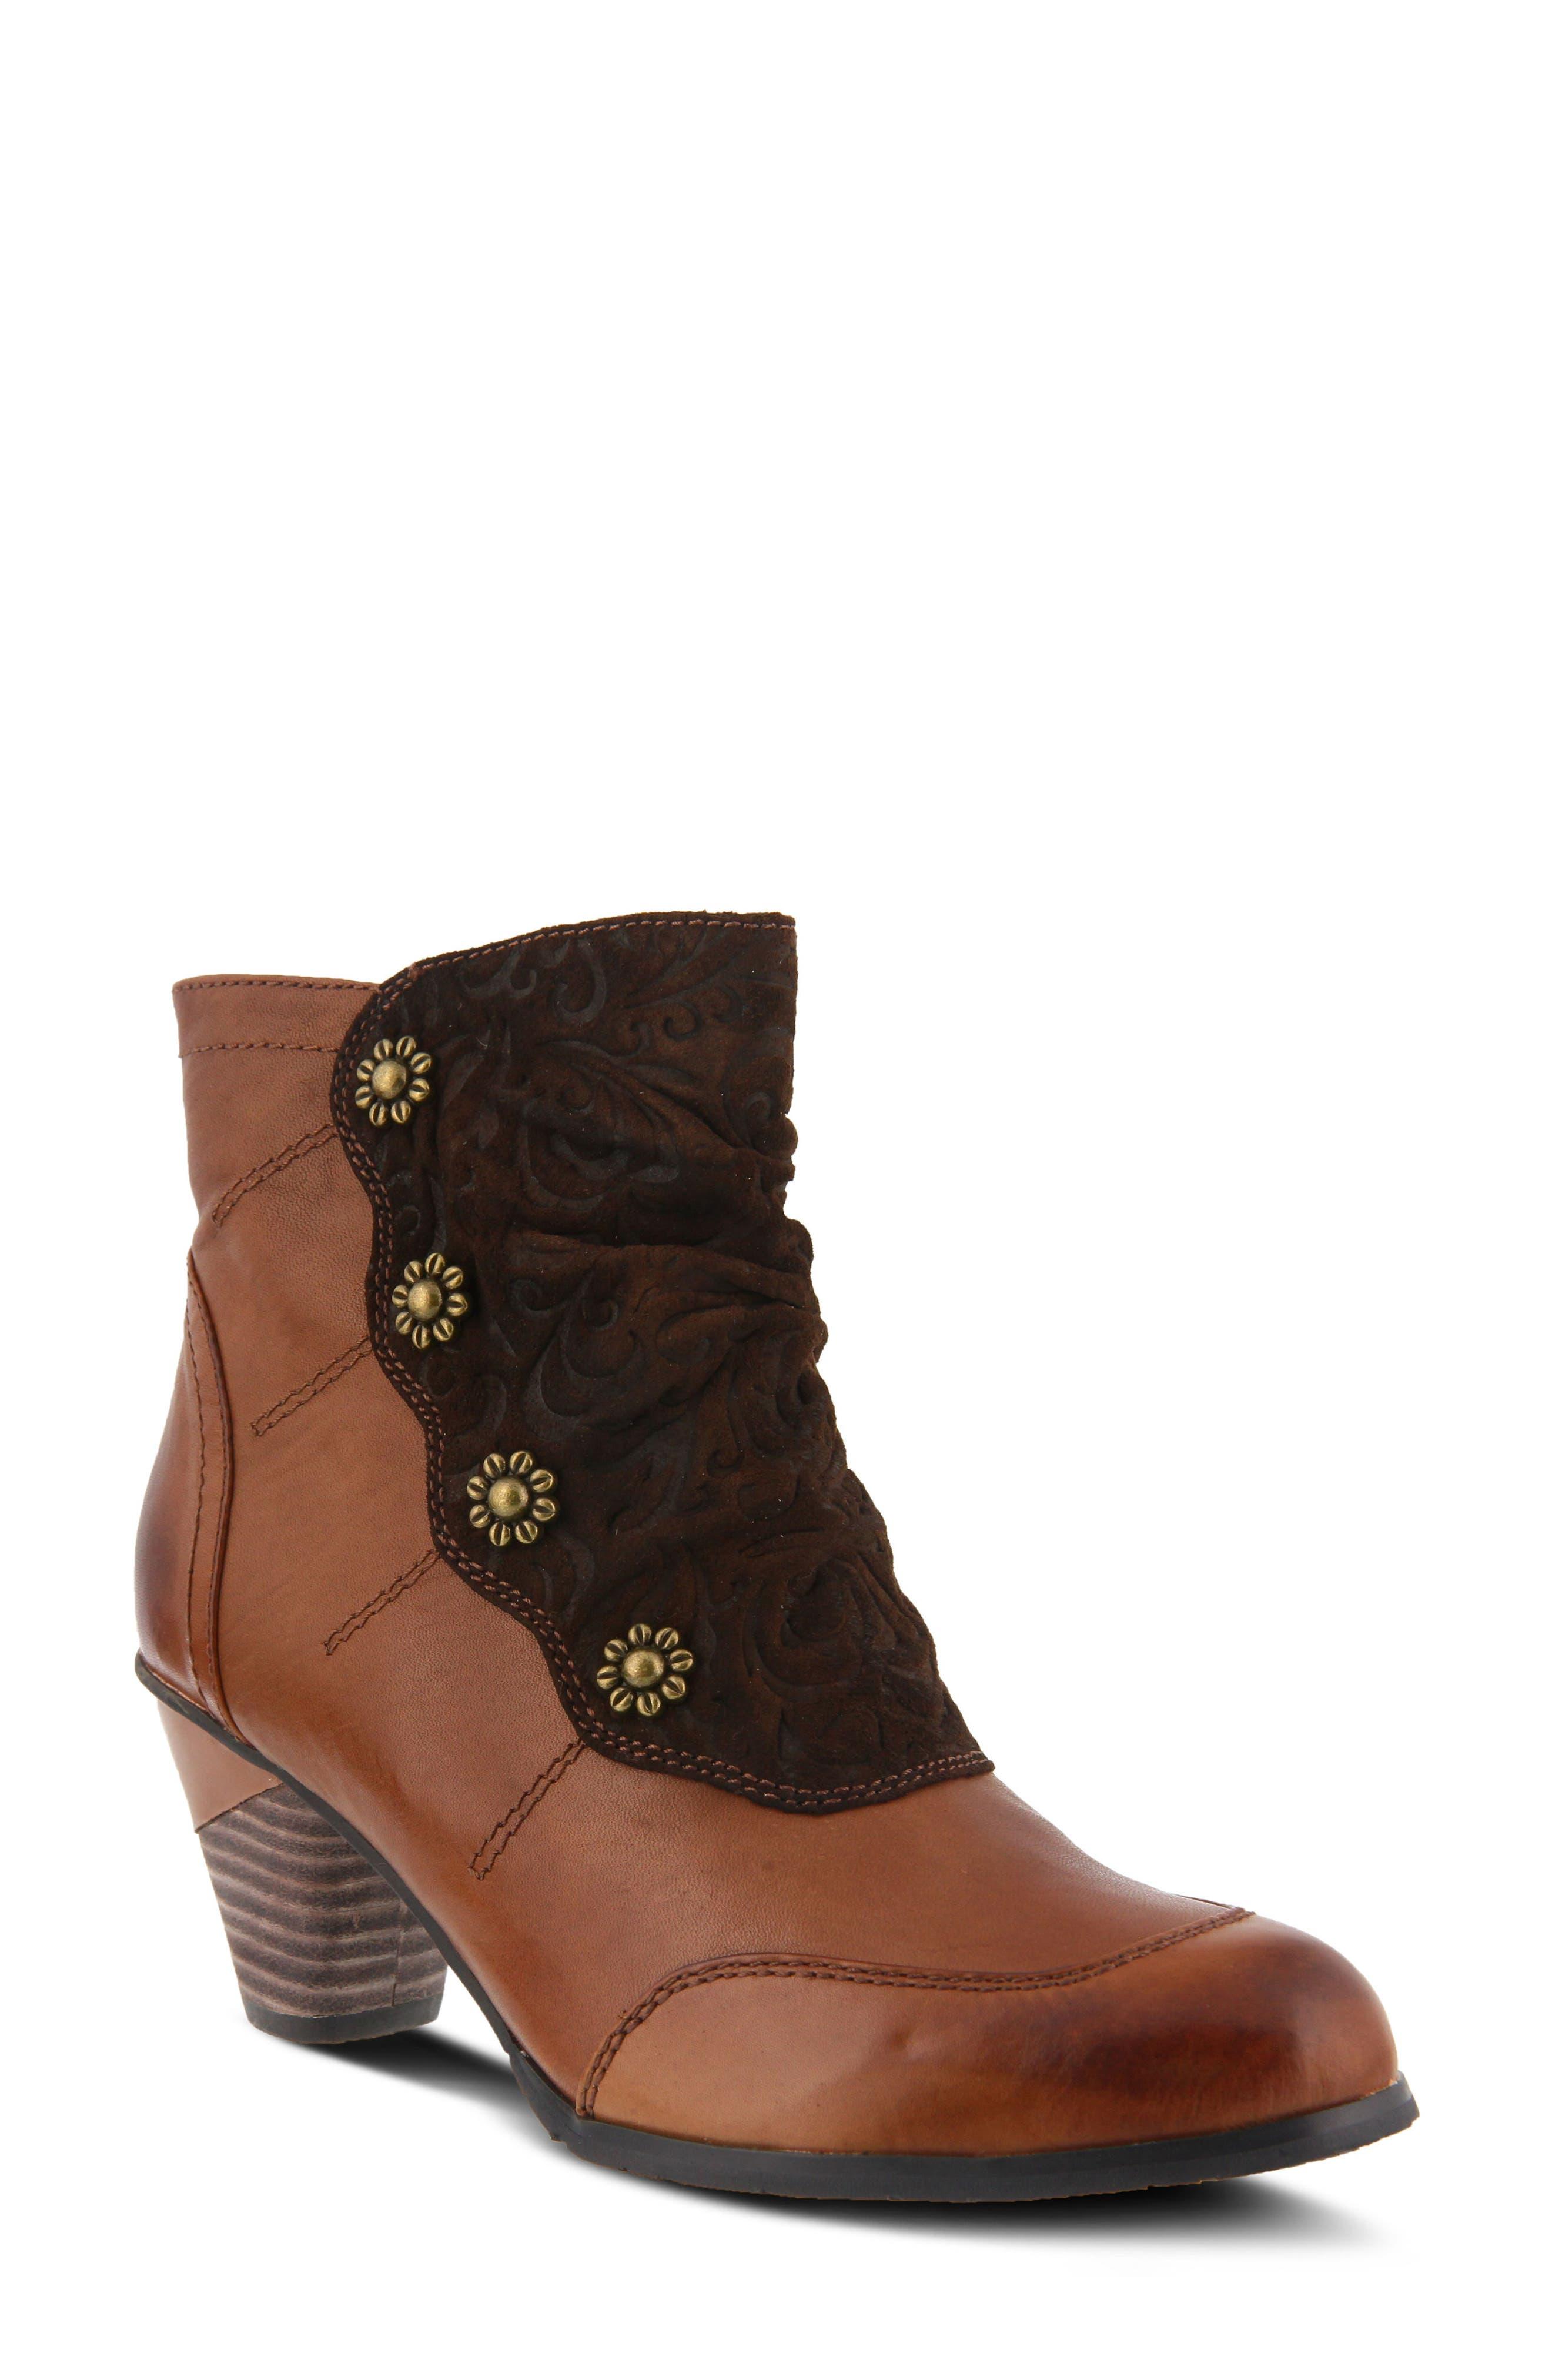 Vintage Boots- Winter Rain and Snow Boots Womens LArtiste Belgard Bootie Size 5US  35EU - Brown $139.95 AT vintagedancer.com